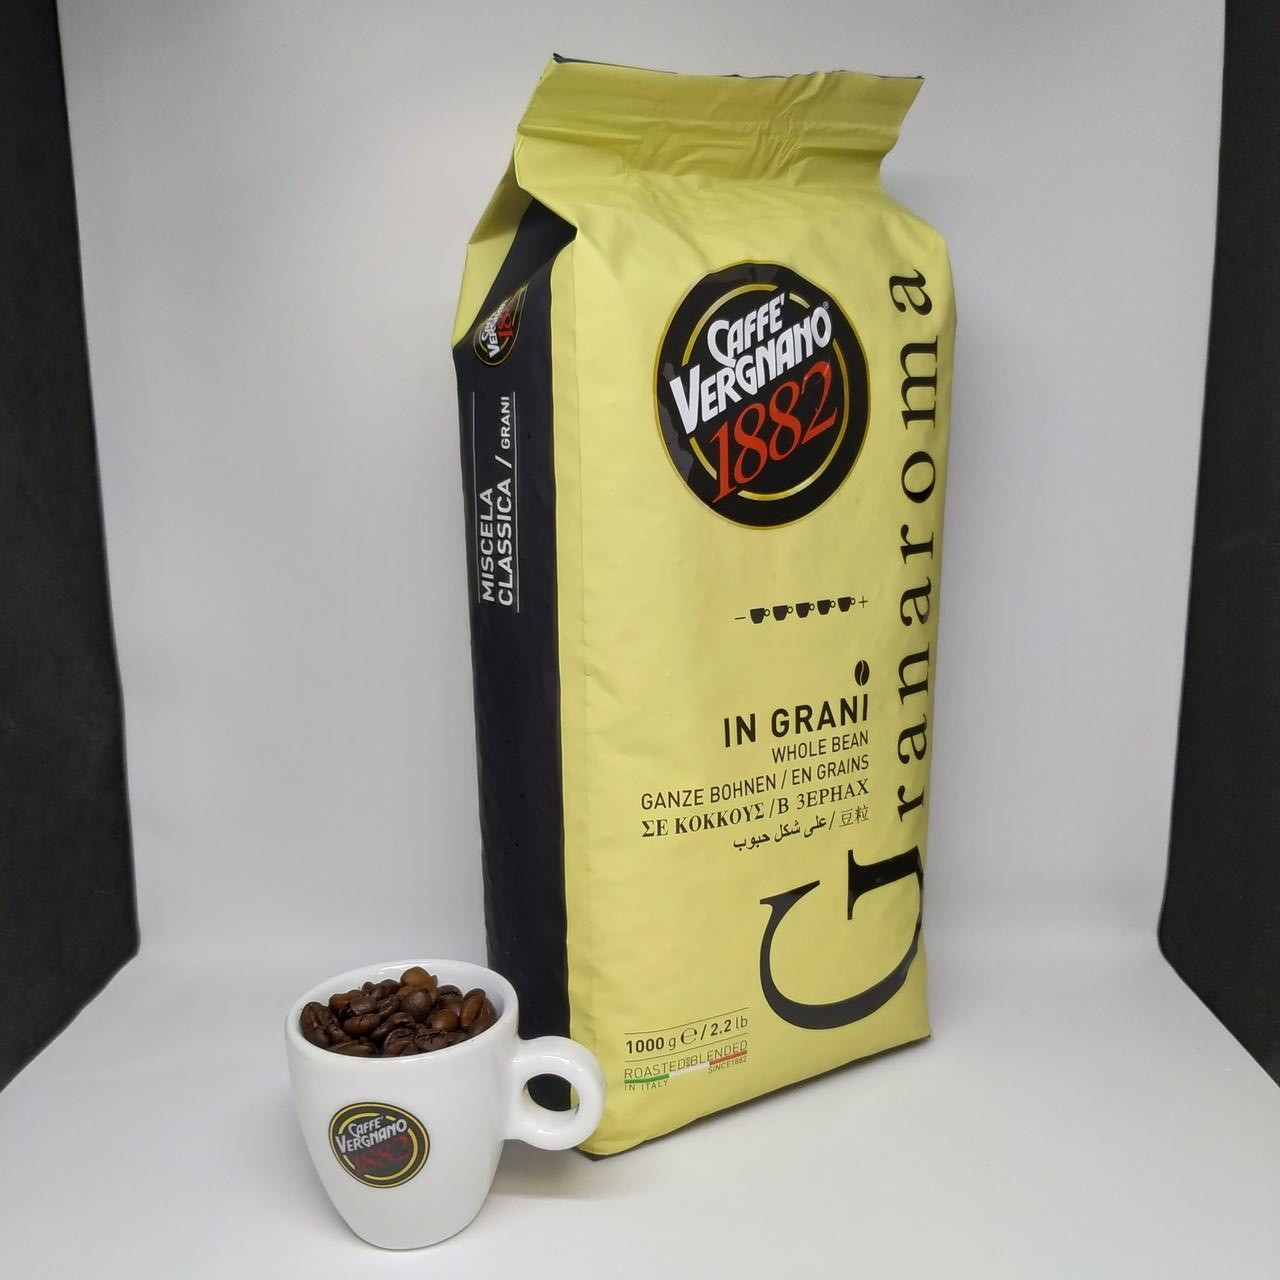 Caffe Vergnano 1882 Gran Aroma - Кофе в зернах